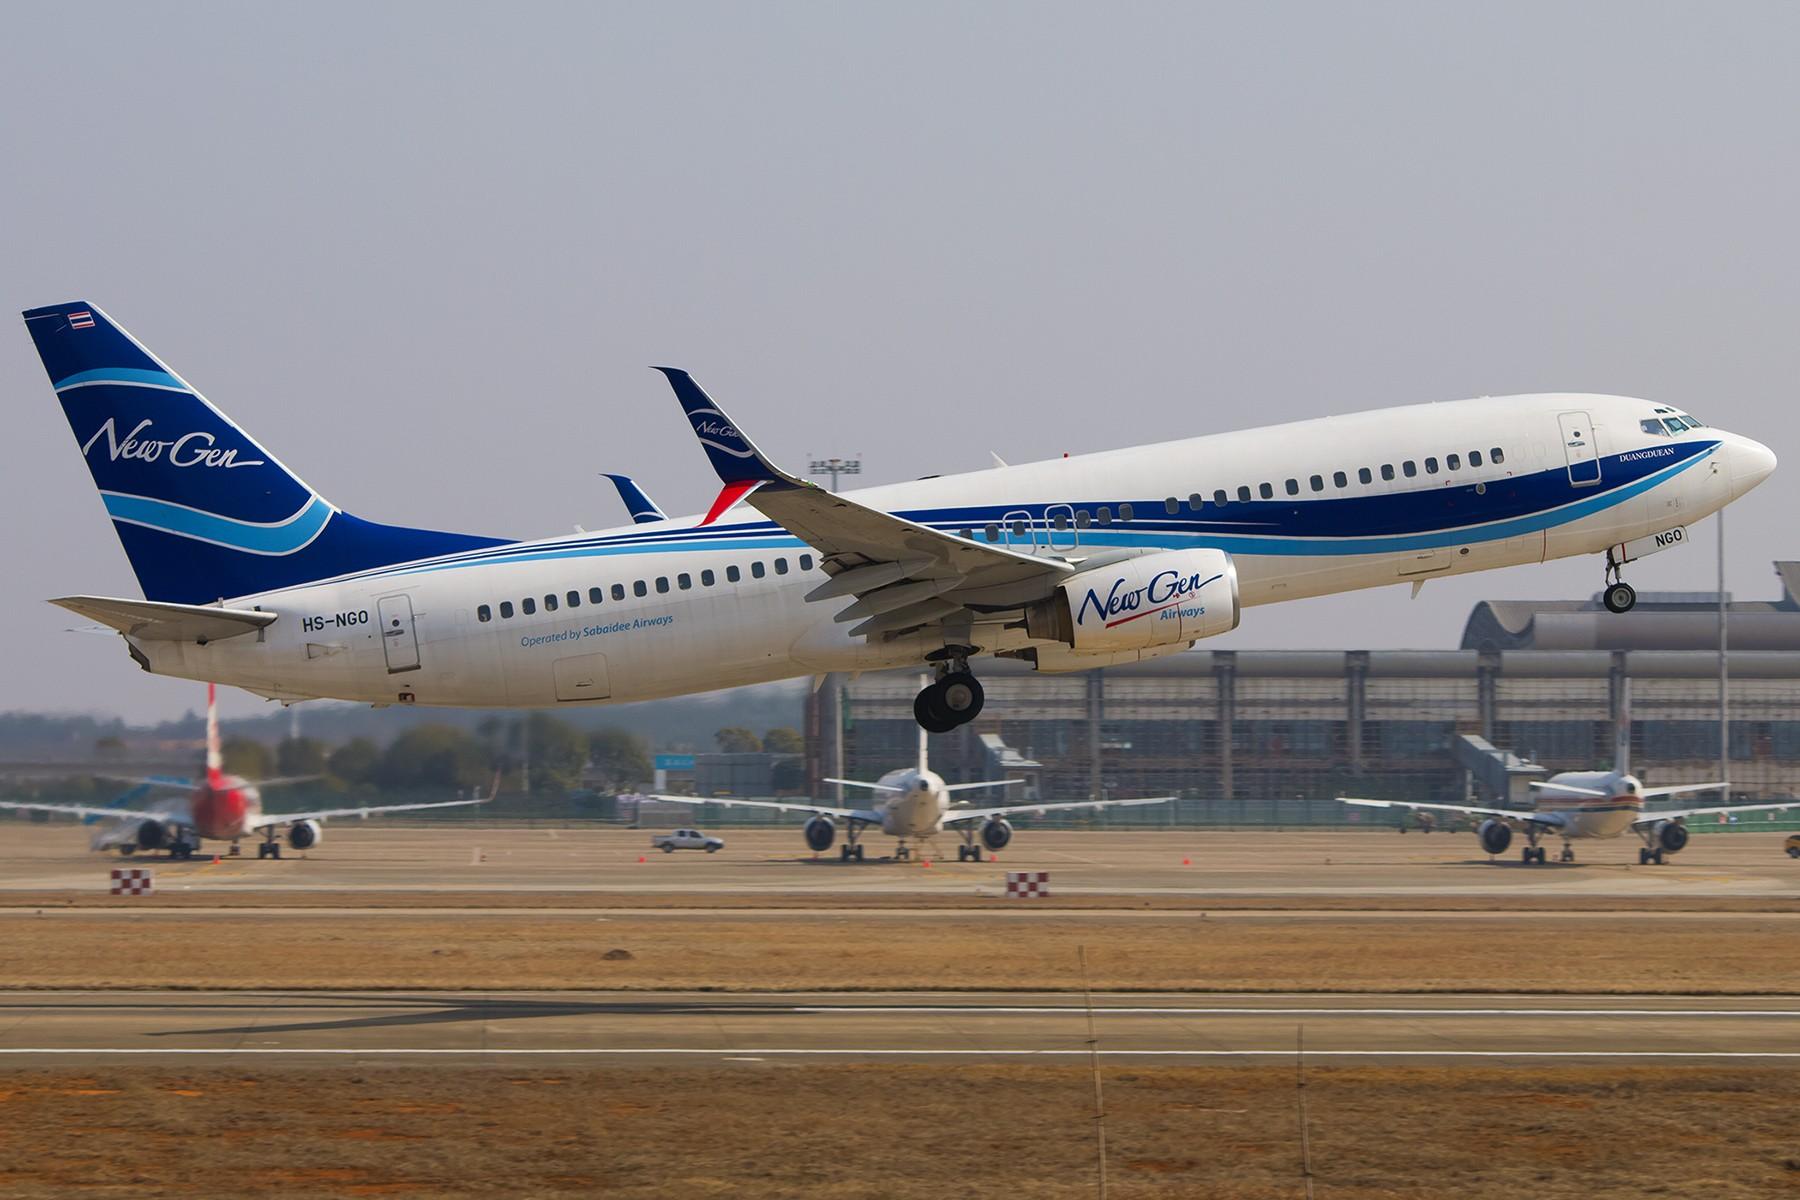 Re:[原创]【南昌飞友会】祝大家狗年大吉!!!四张存货福利!! BOEING 737-800 HS-NGO 中国南昌昌北国际机场